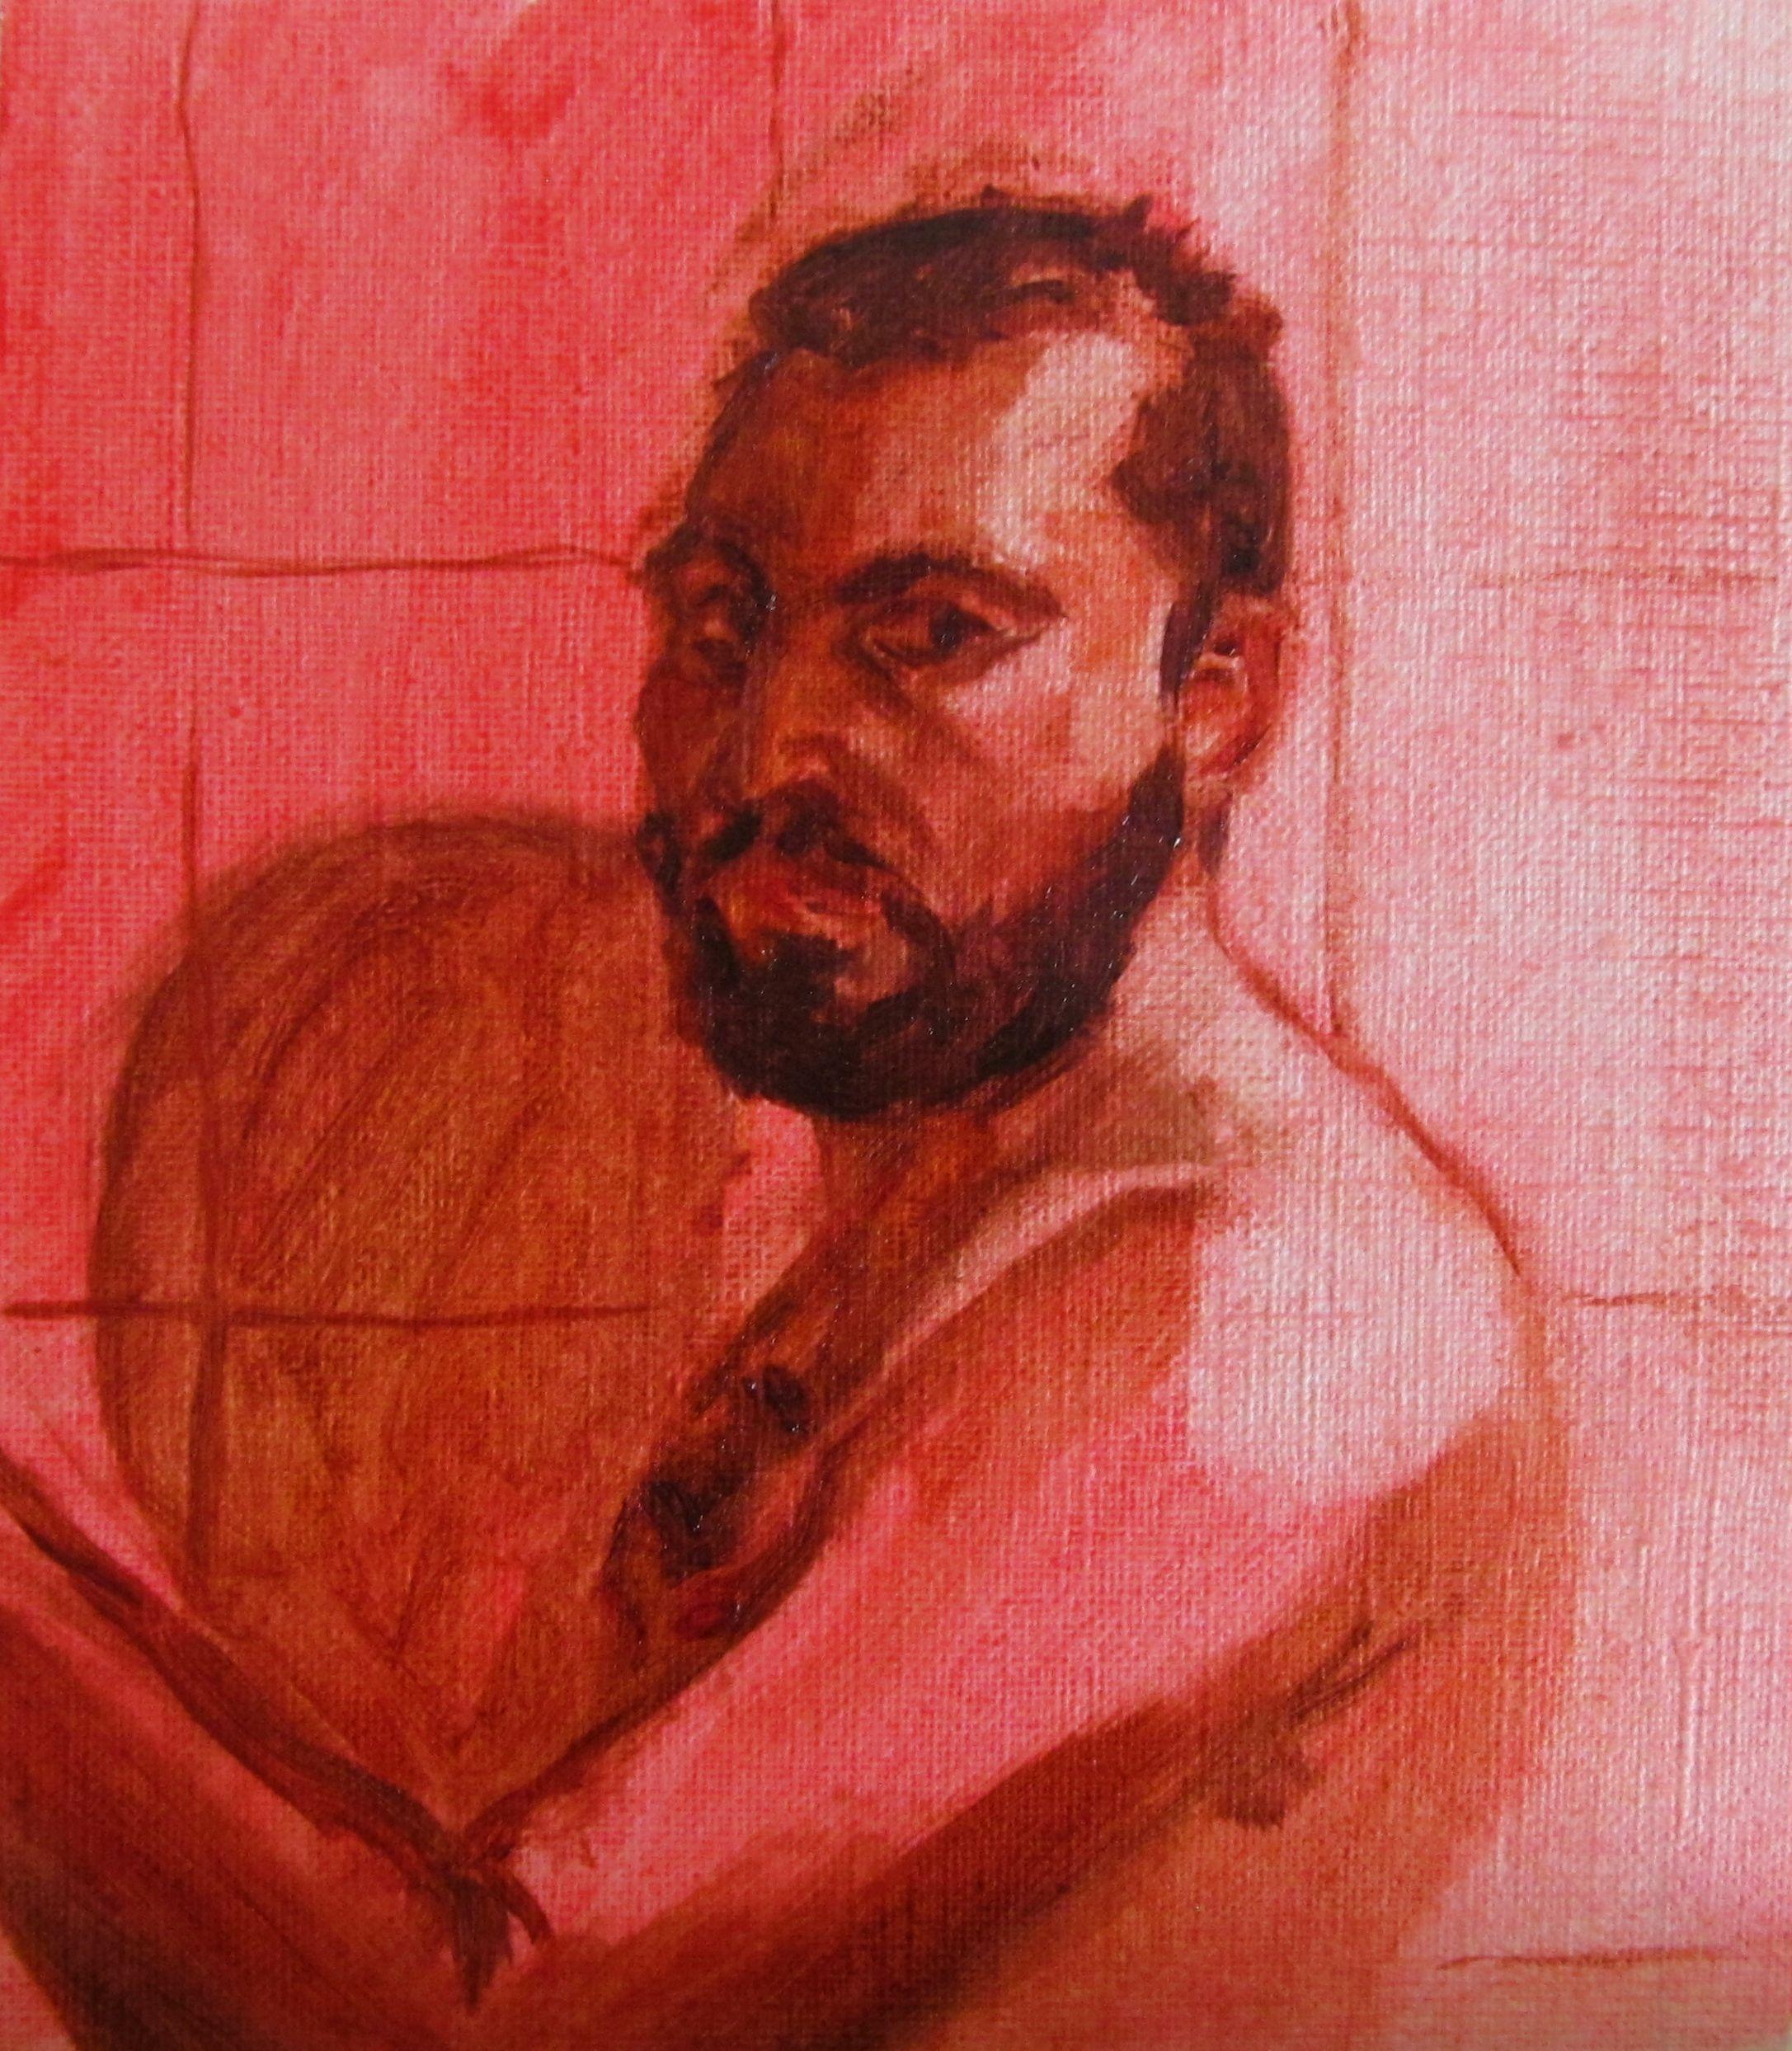 Filipe Silva, auto retrato, óleo sobre papel, 2016.